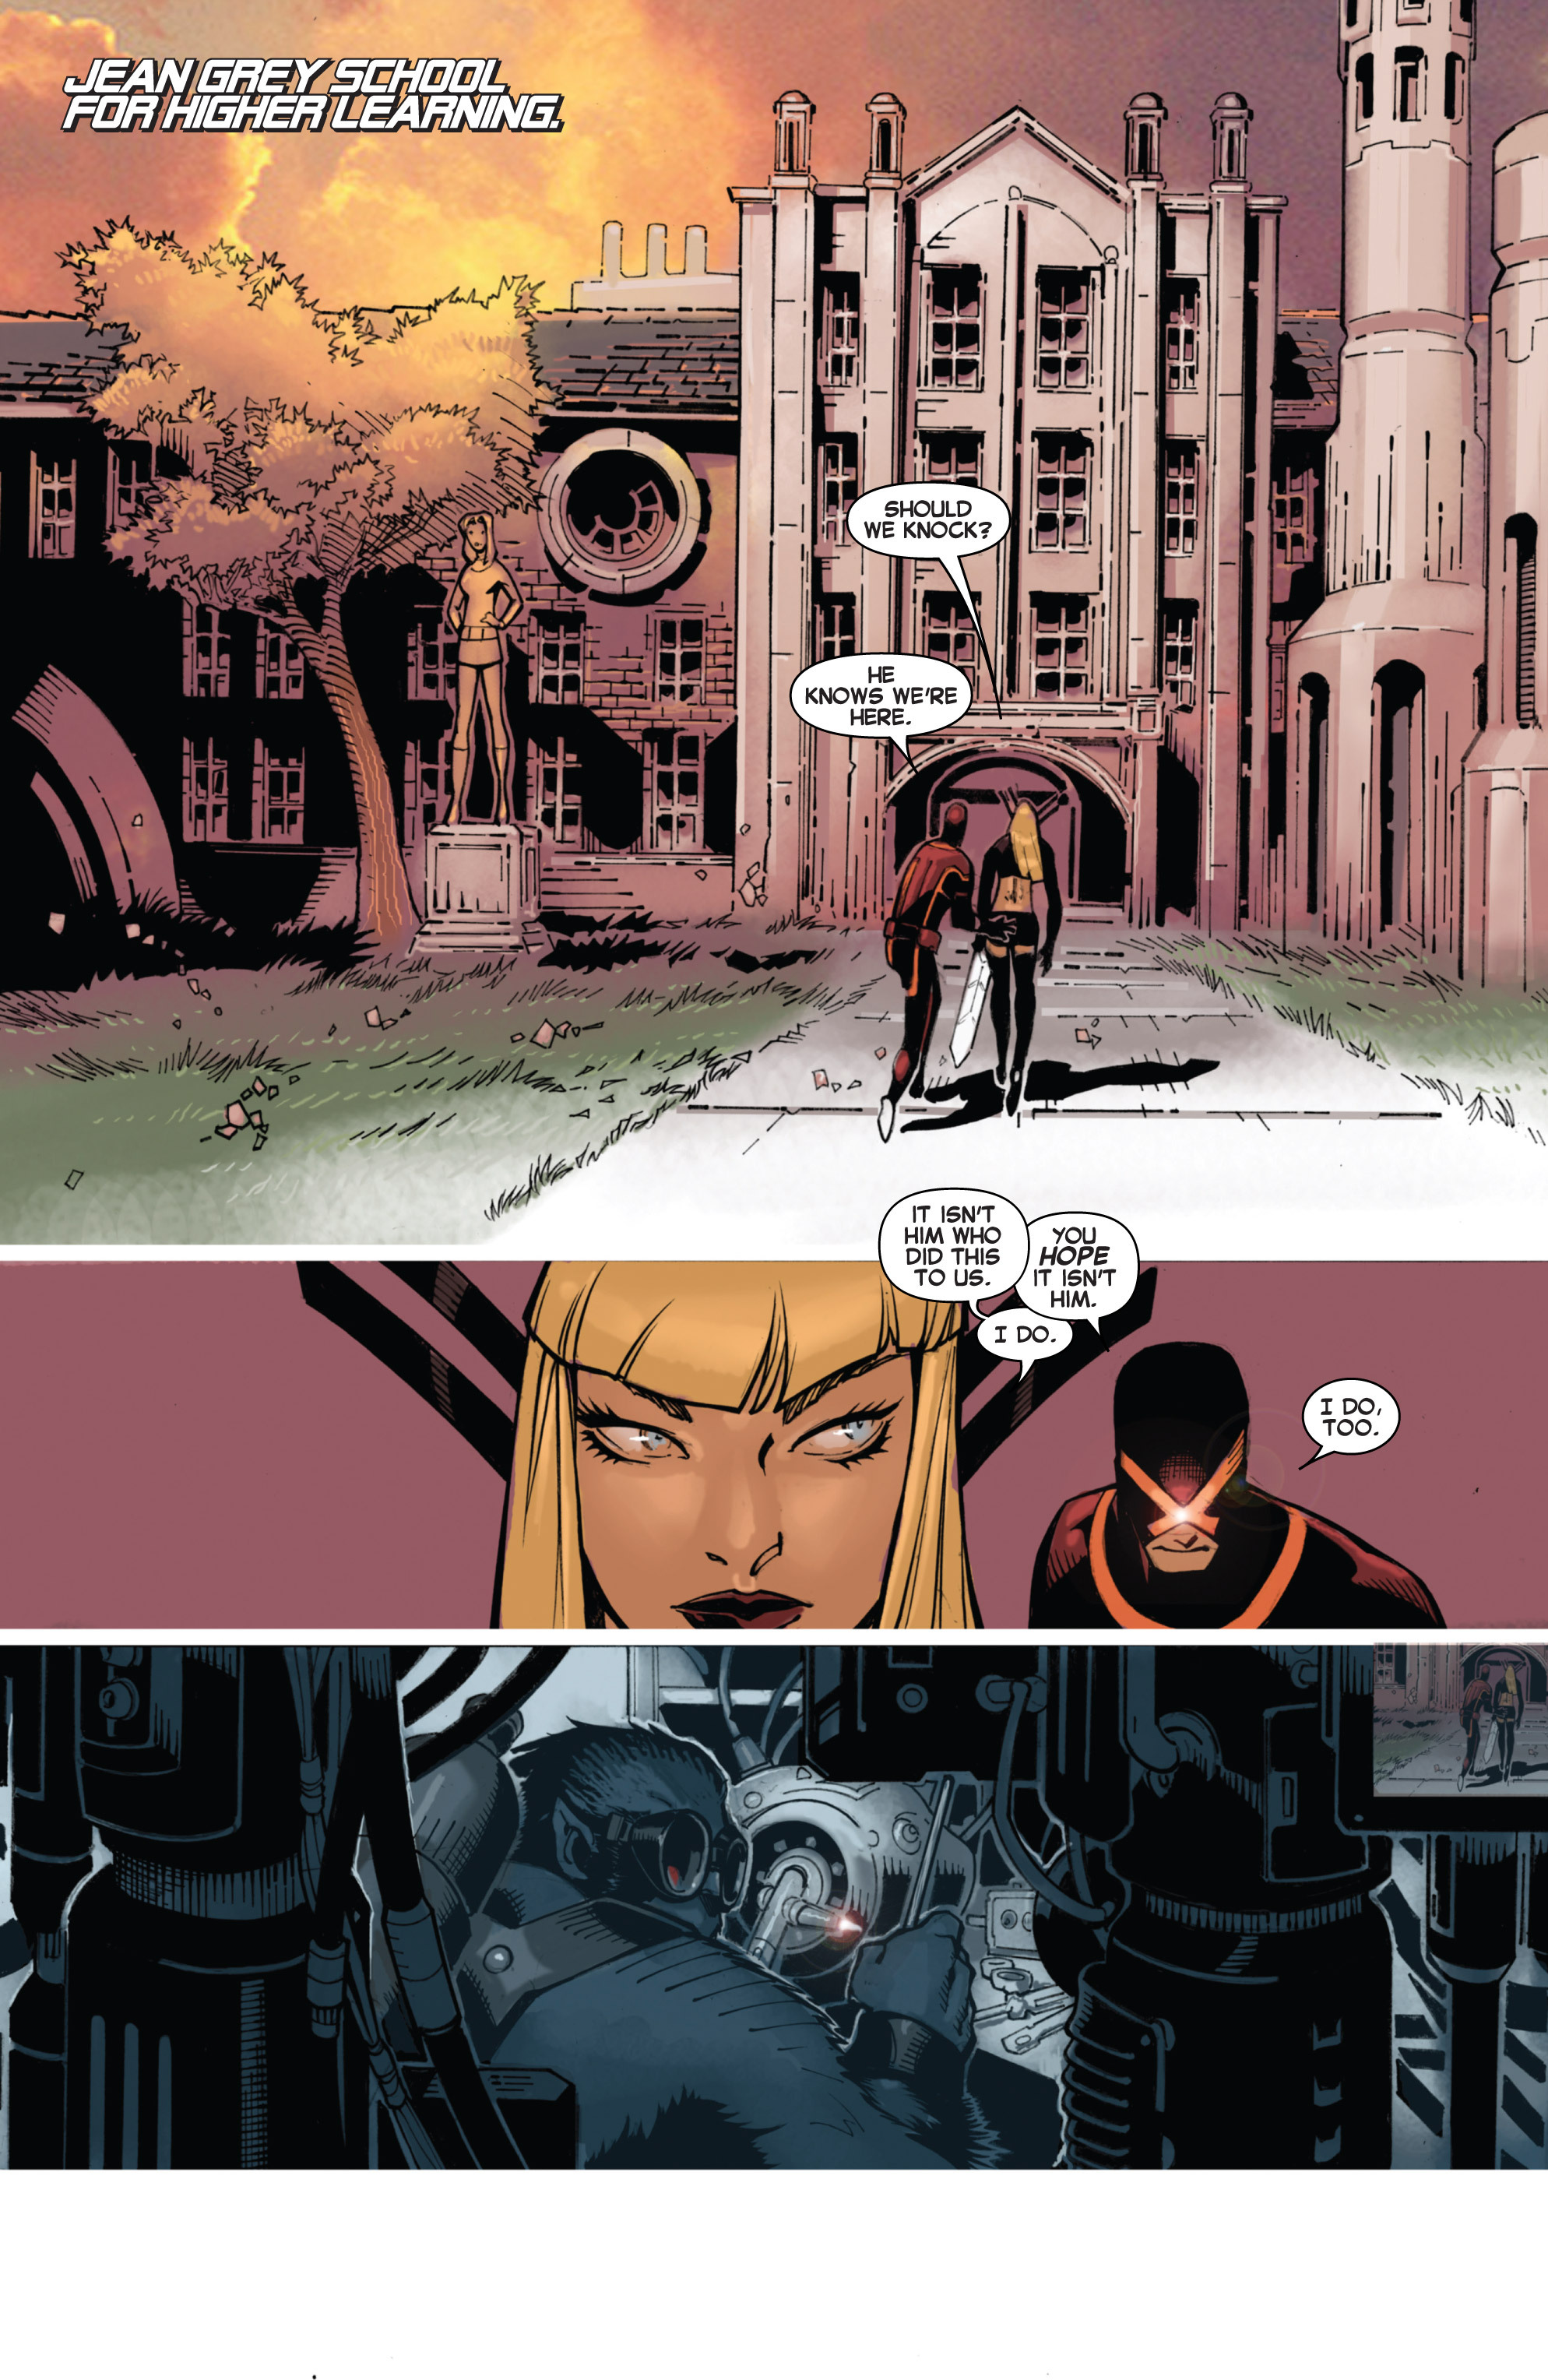 Read online Uncanny X-Men (2013) comic -  Issue # _TPB 4 - vs. S.H.I.E.L.D - 39